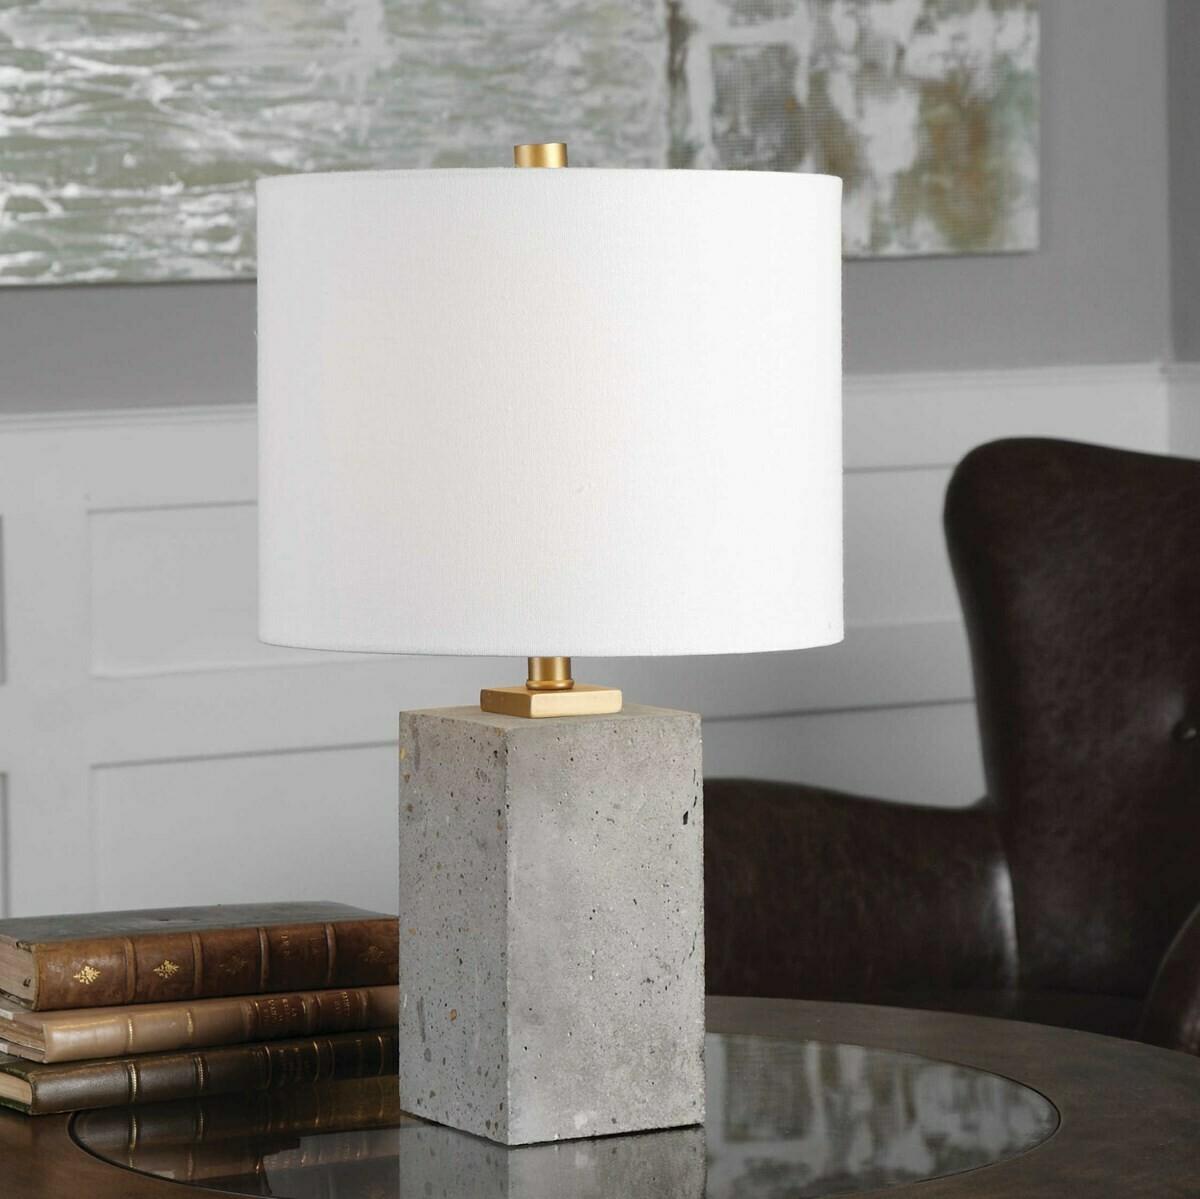 Drexel Table Lamp